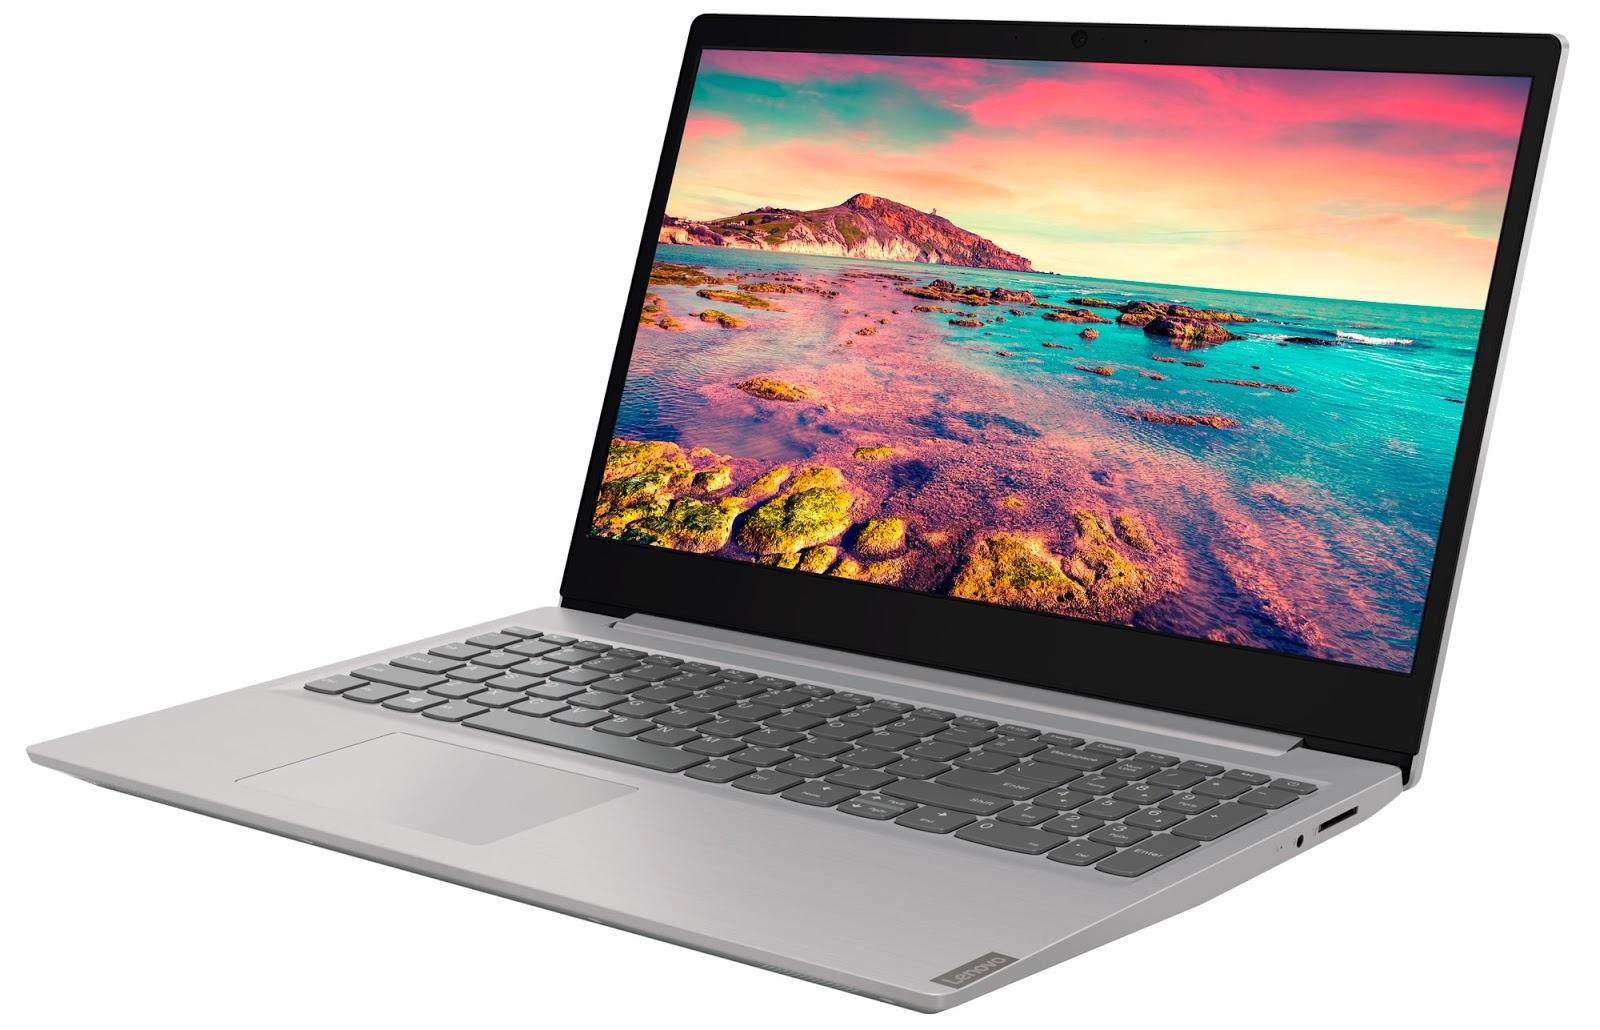 Фото 2. Ноутбук Lenovo ideapad S145-15AST (81N300EYRE)